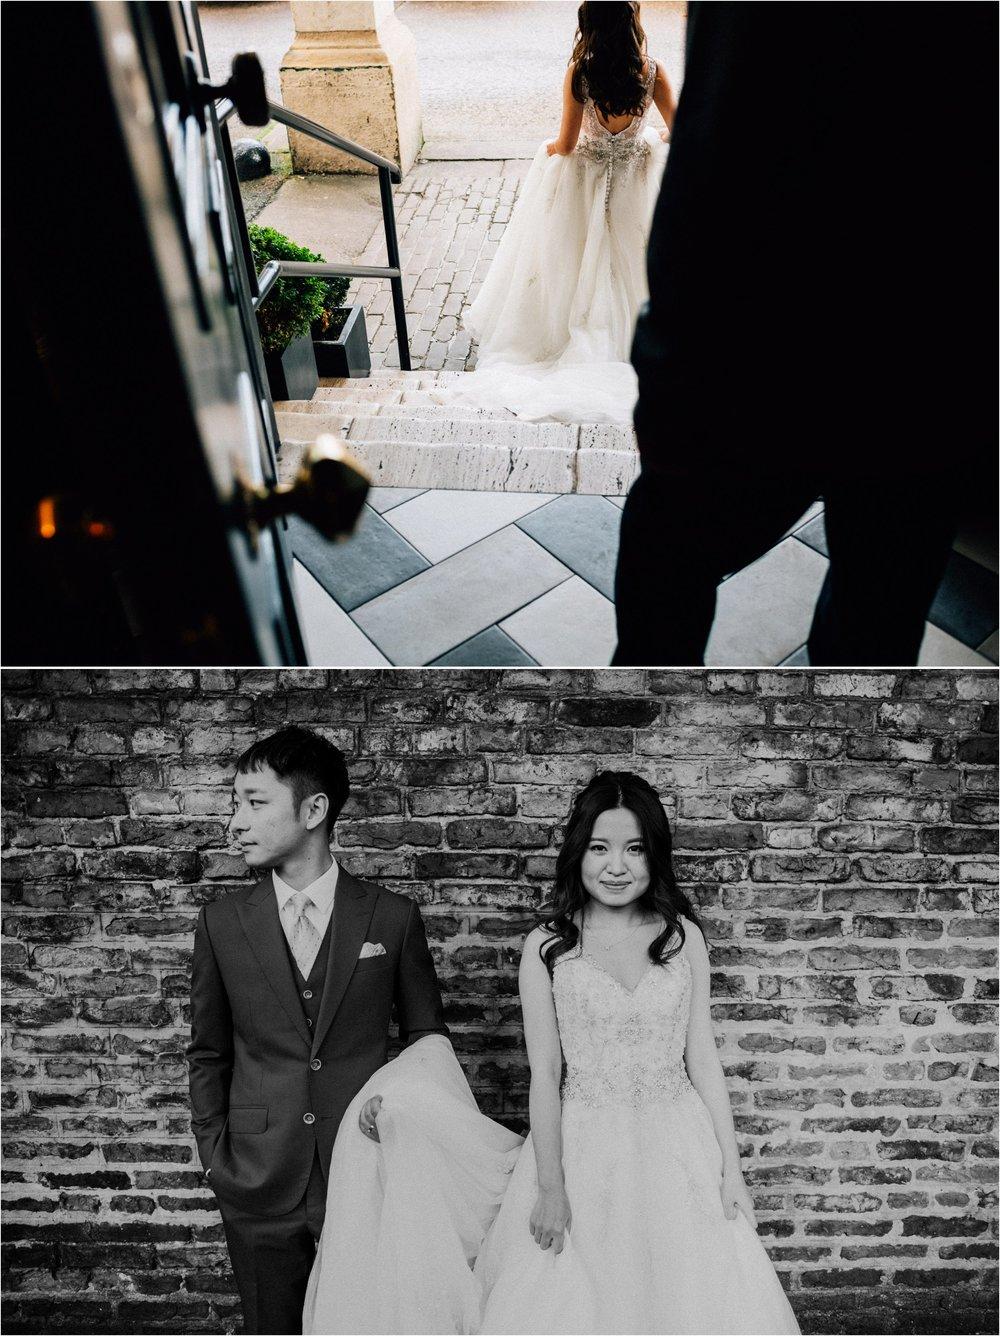 York city elopement wedding photographer_0031.jpg